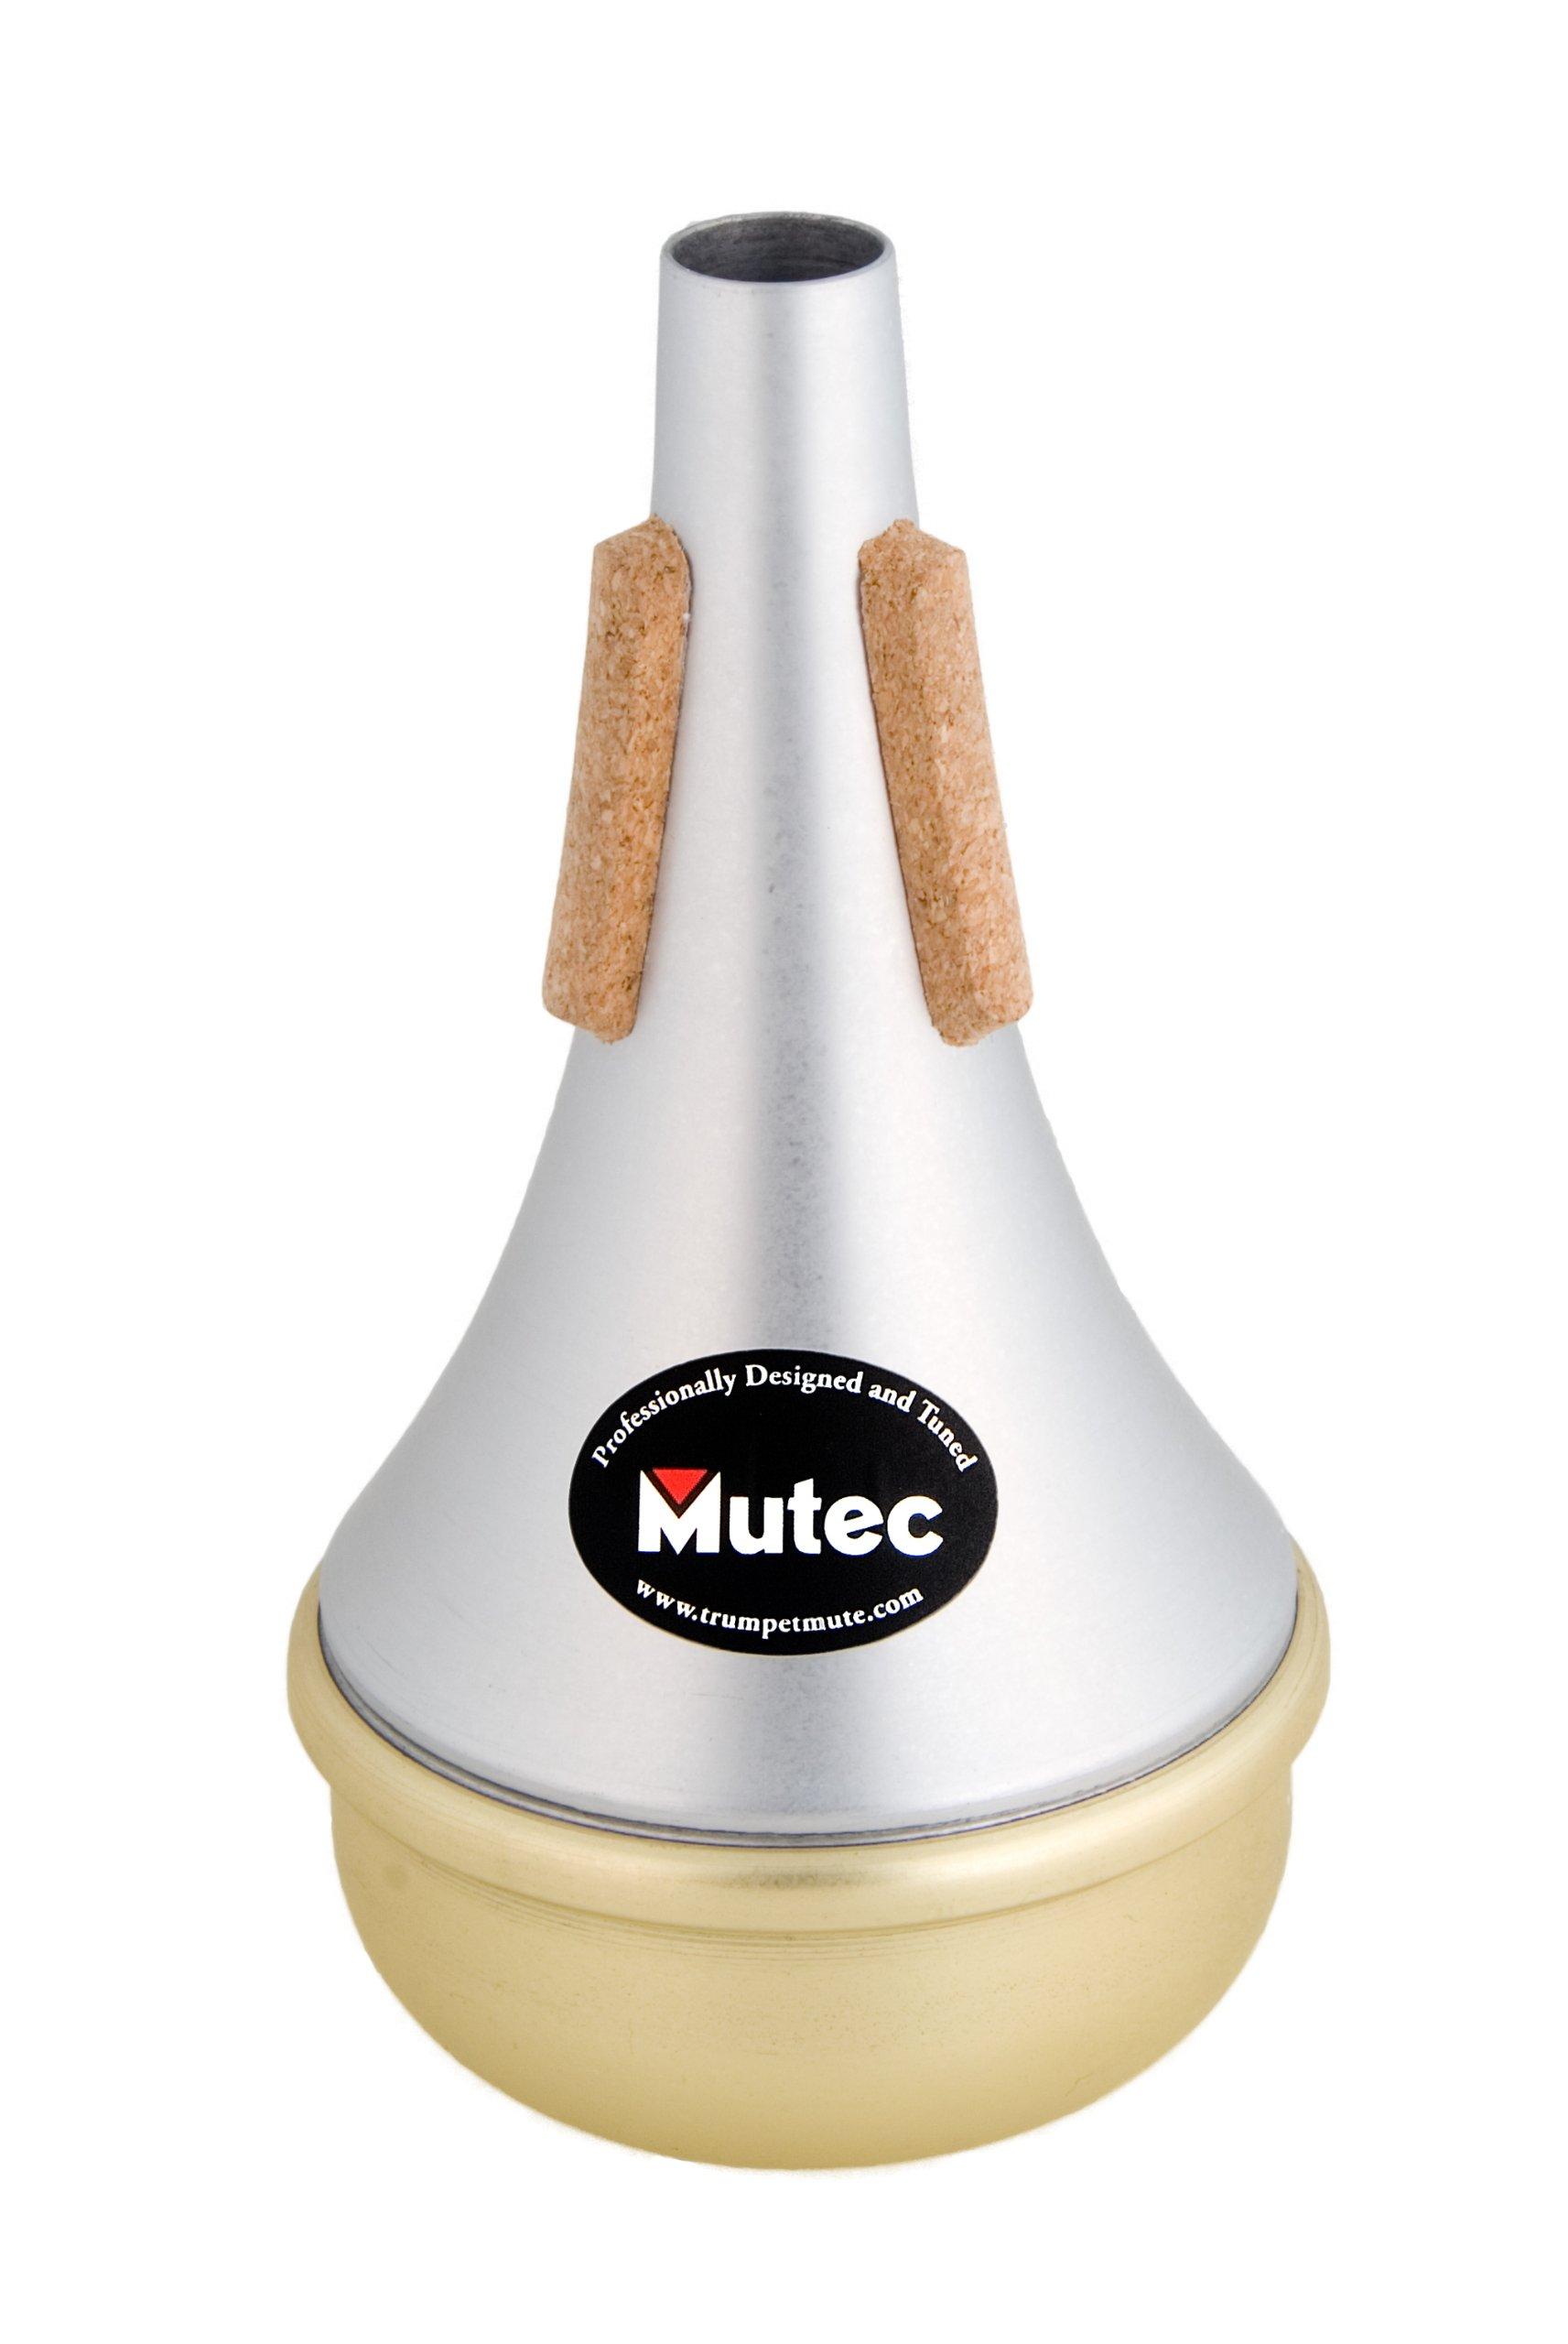 Mutec Straight Mute For Trumpet, Brass Bottom